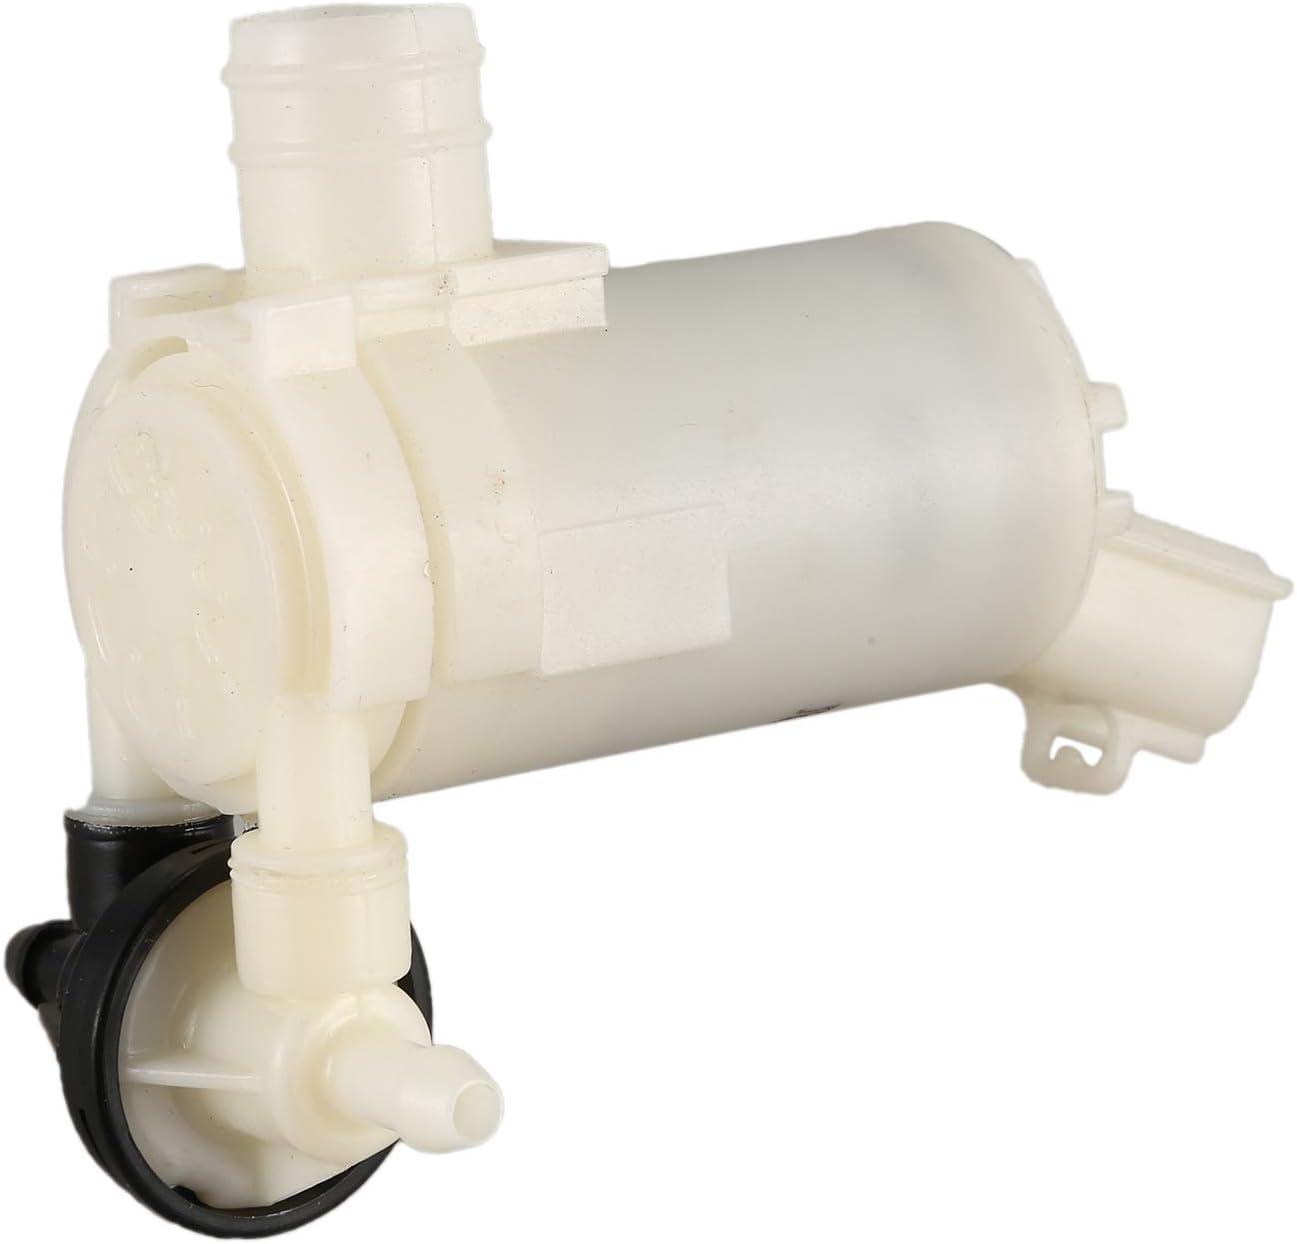 Etase Windshield Washer Pump 76806-SMA-J01 for CR-V 2007-2011 Perfect Match